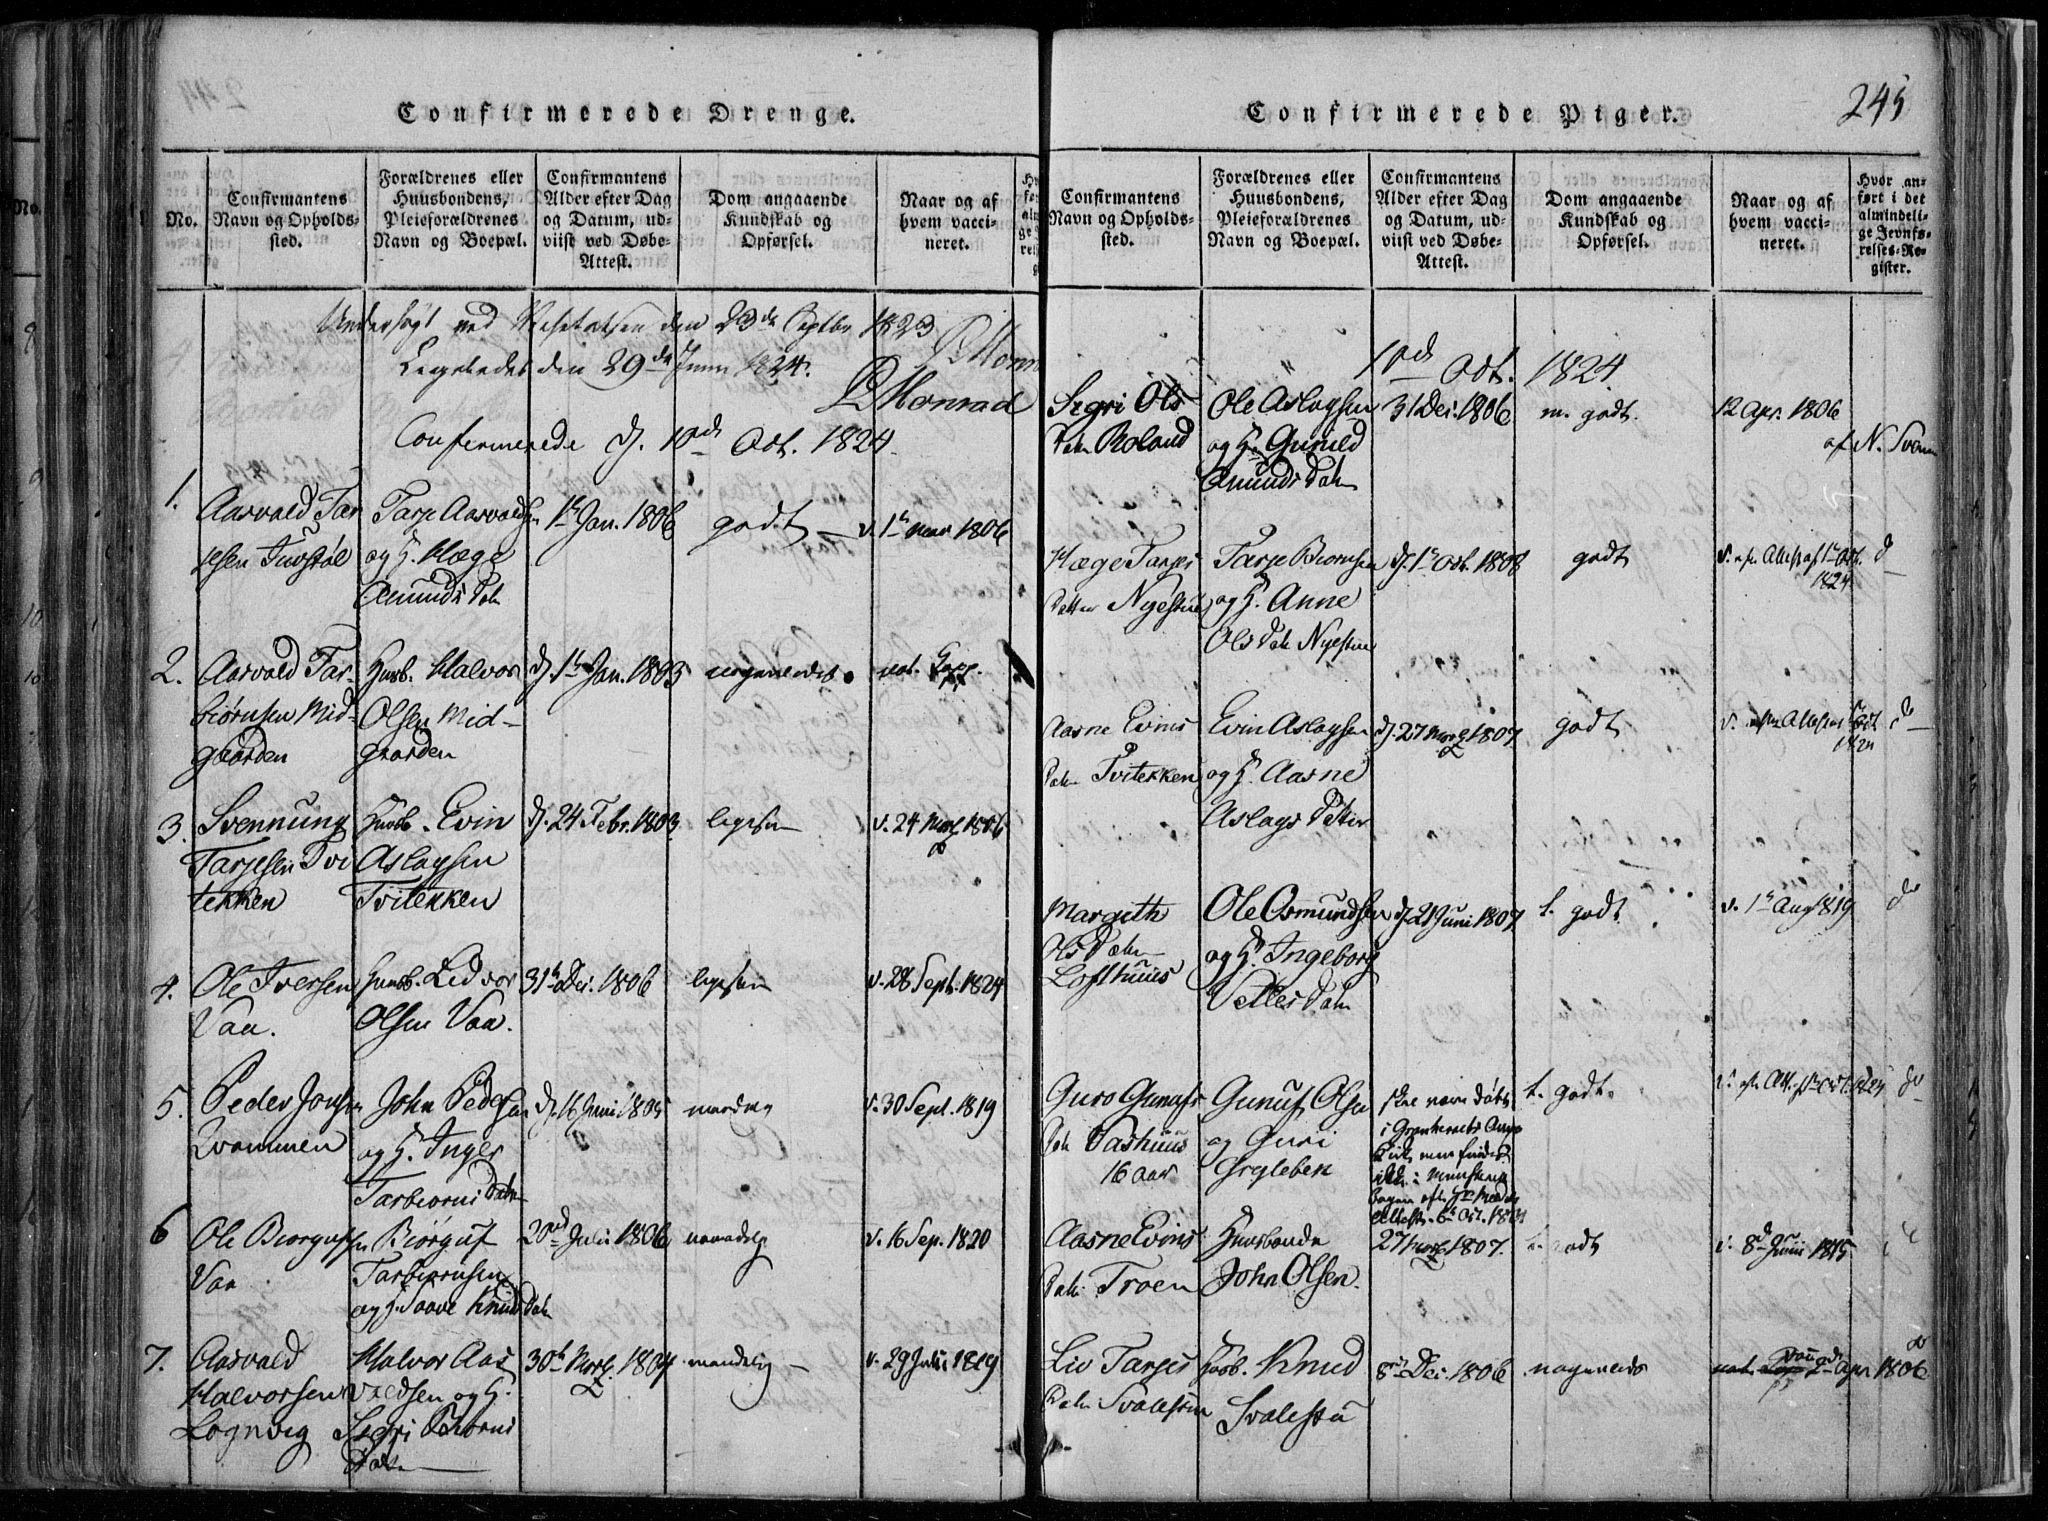 SAKO, Rauland kirkebøker, F/Fa/L0001: Ministerialbok nr. 1, 1814-1859, s. 245